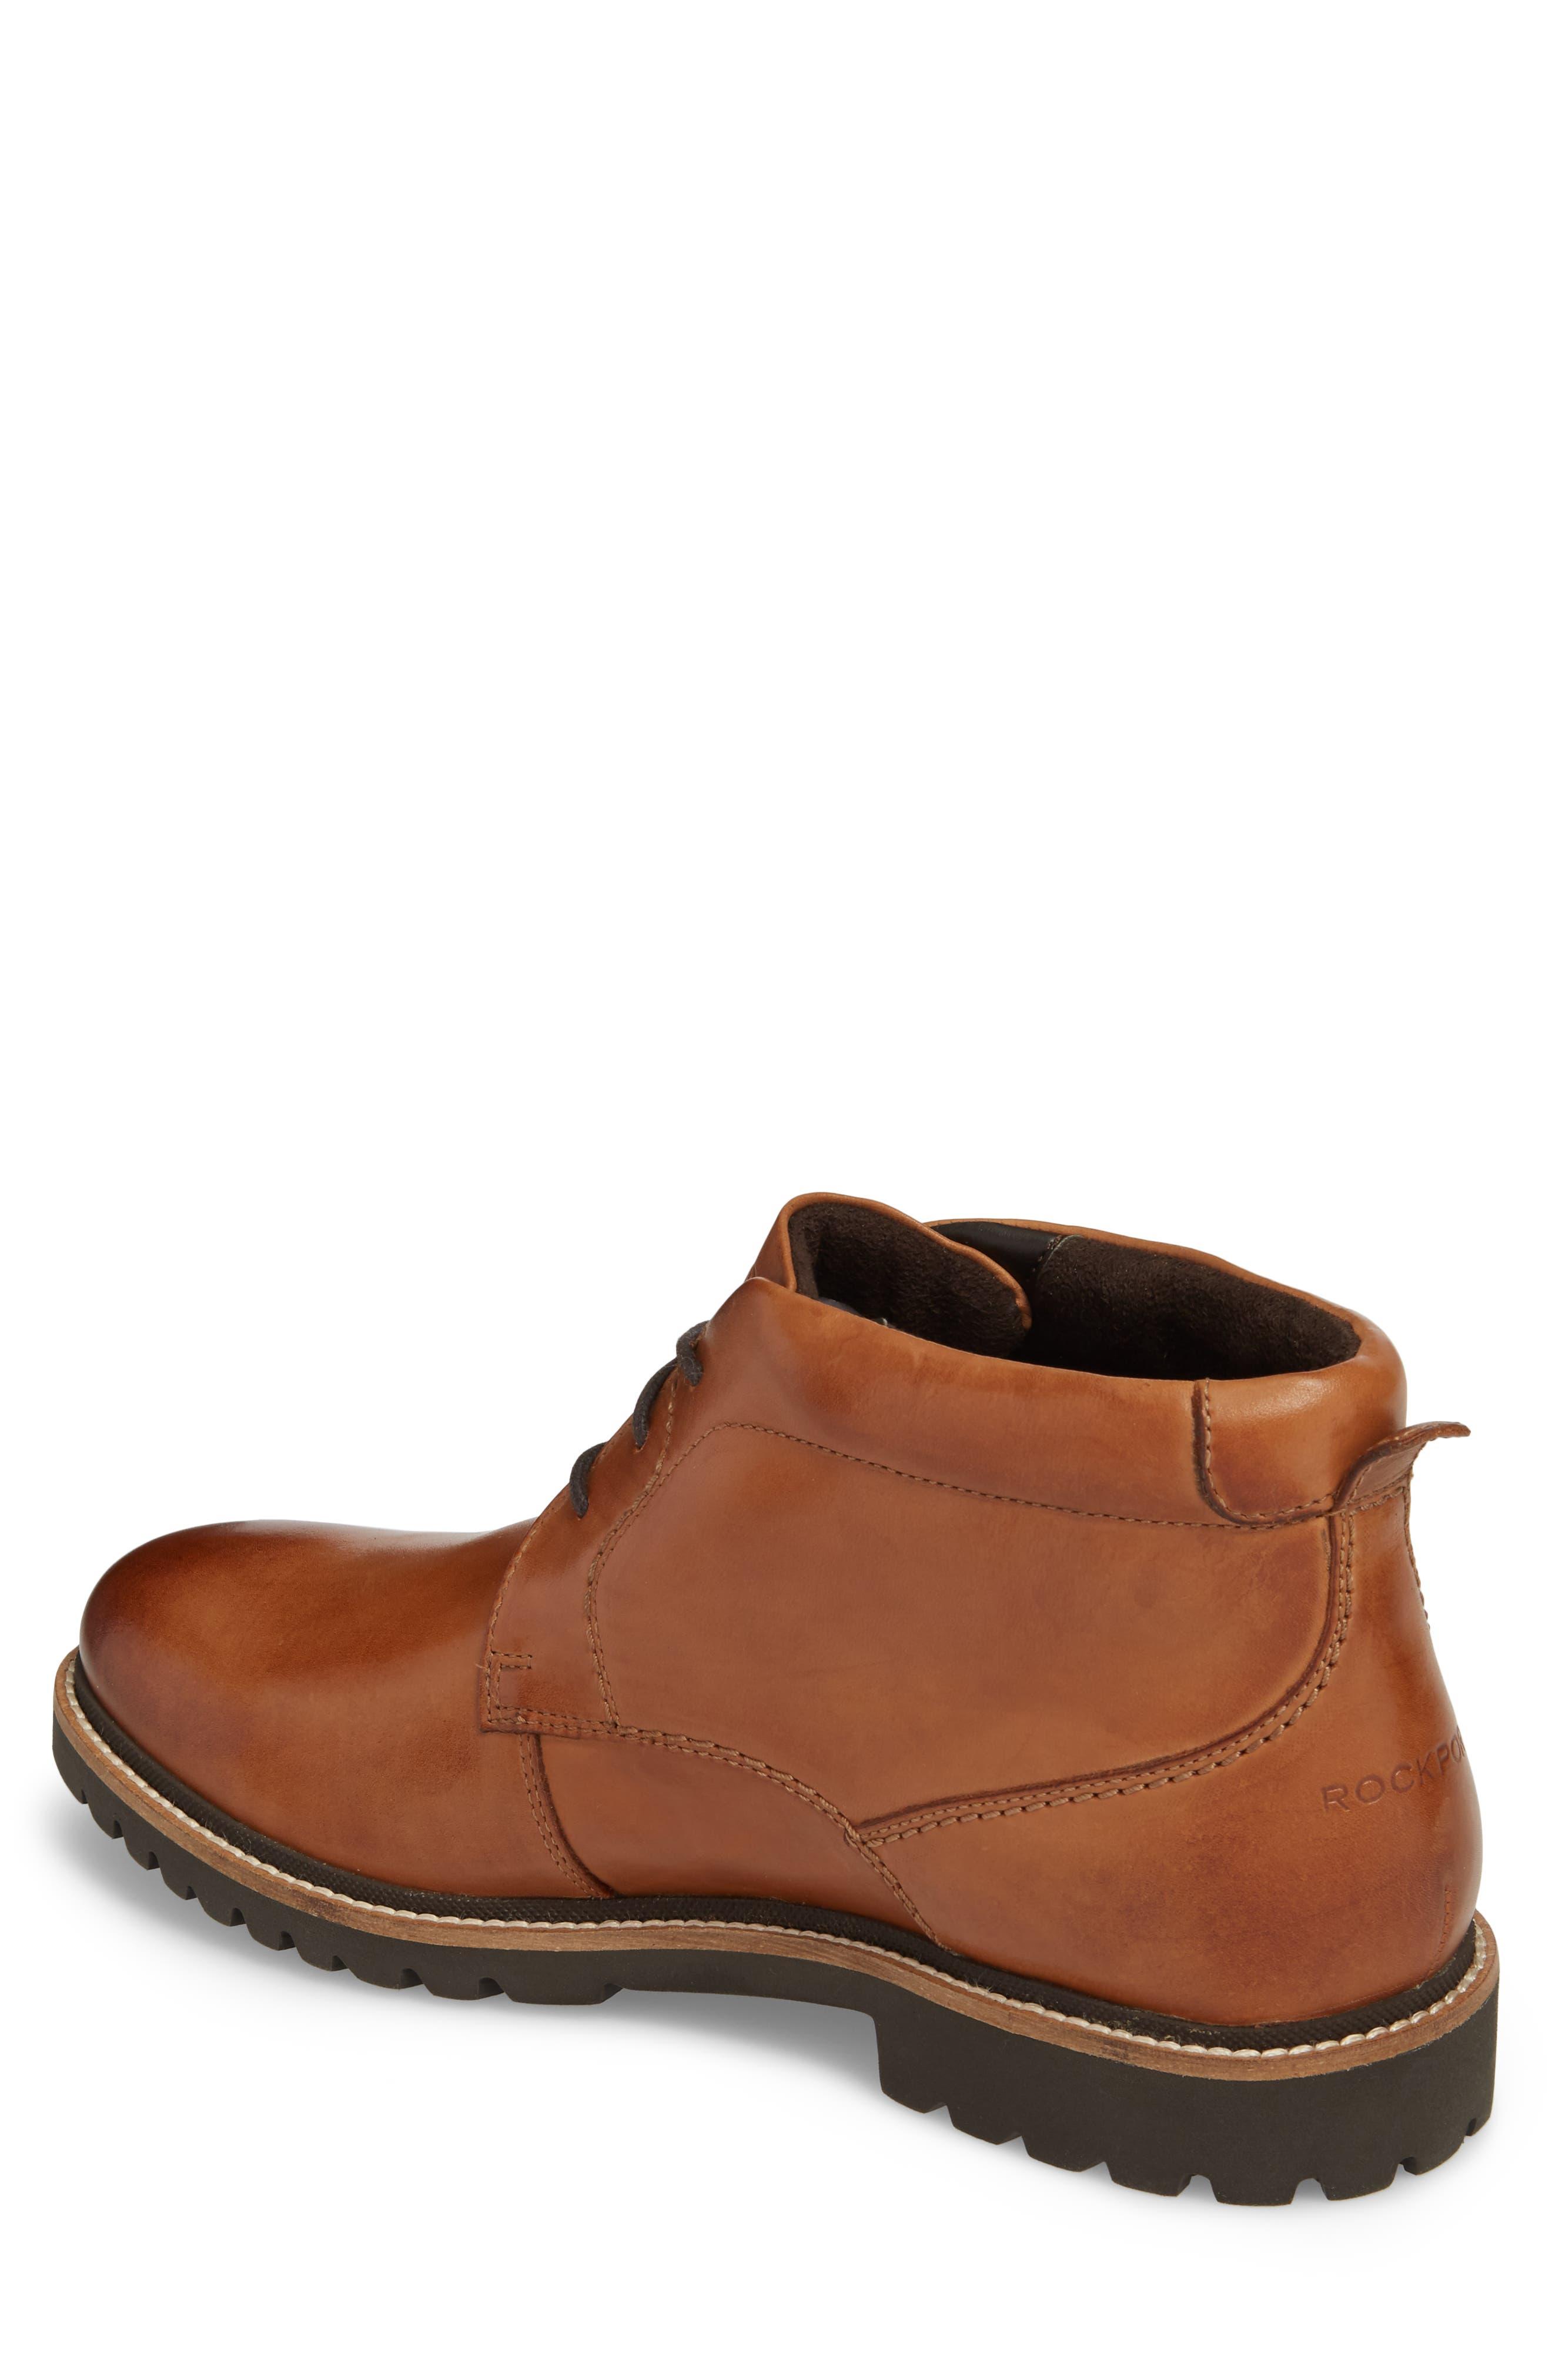 Marshall Chukka Boot,                             Alternate thumbnail 2, color,                             Cognac Leather